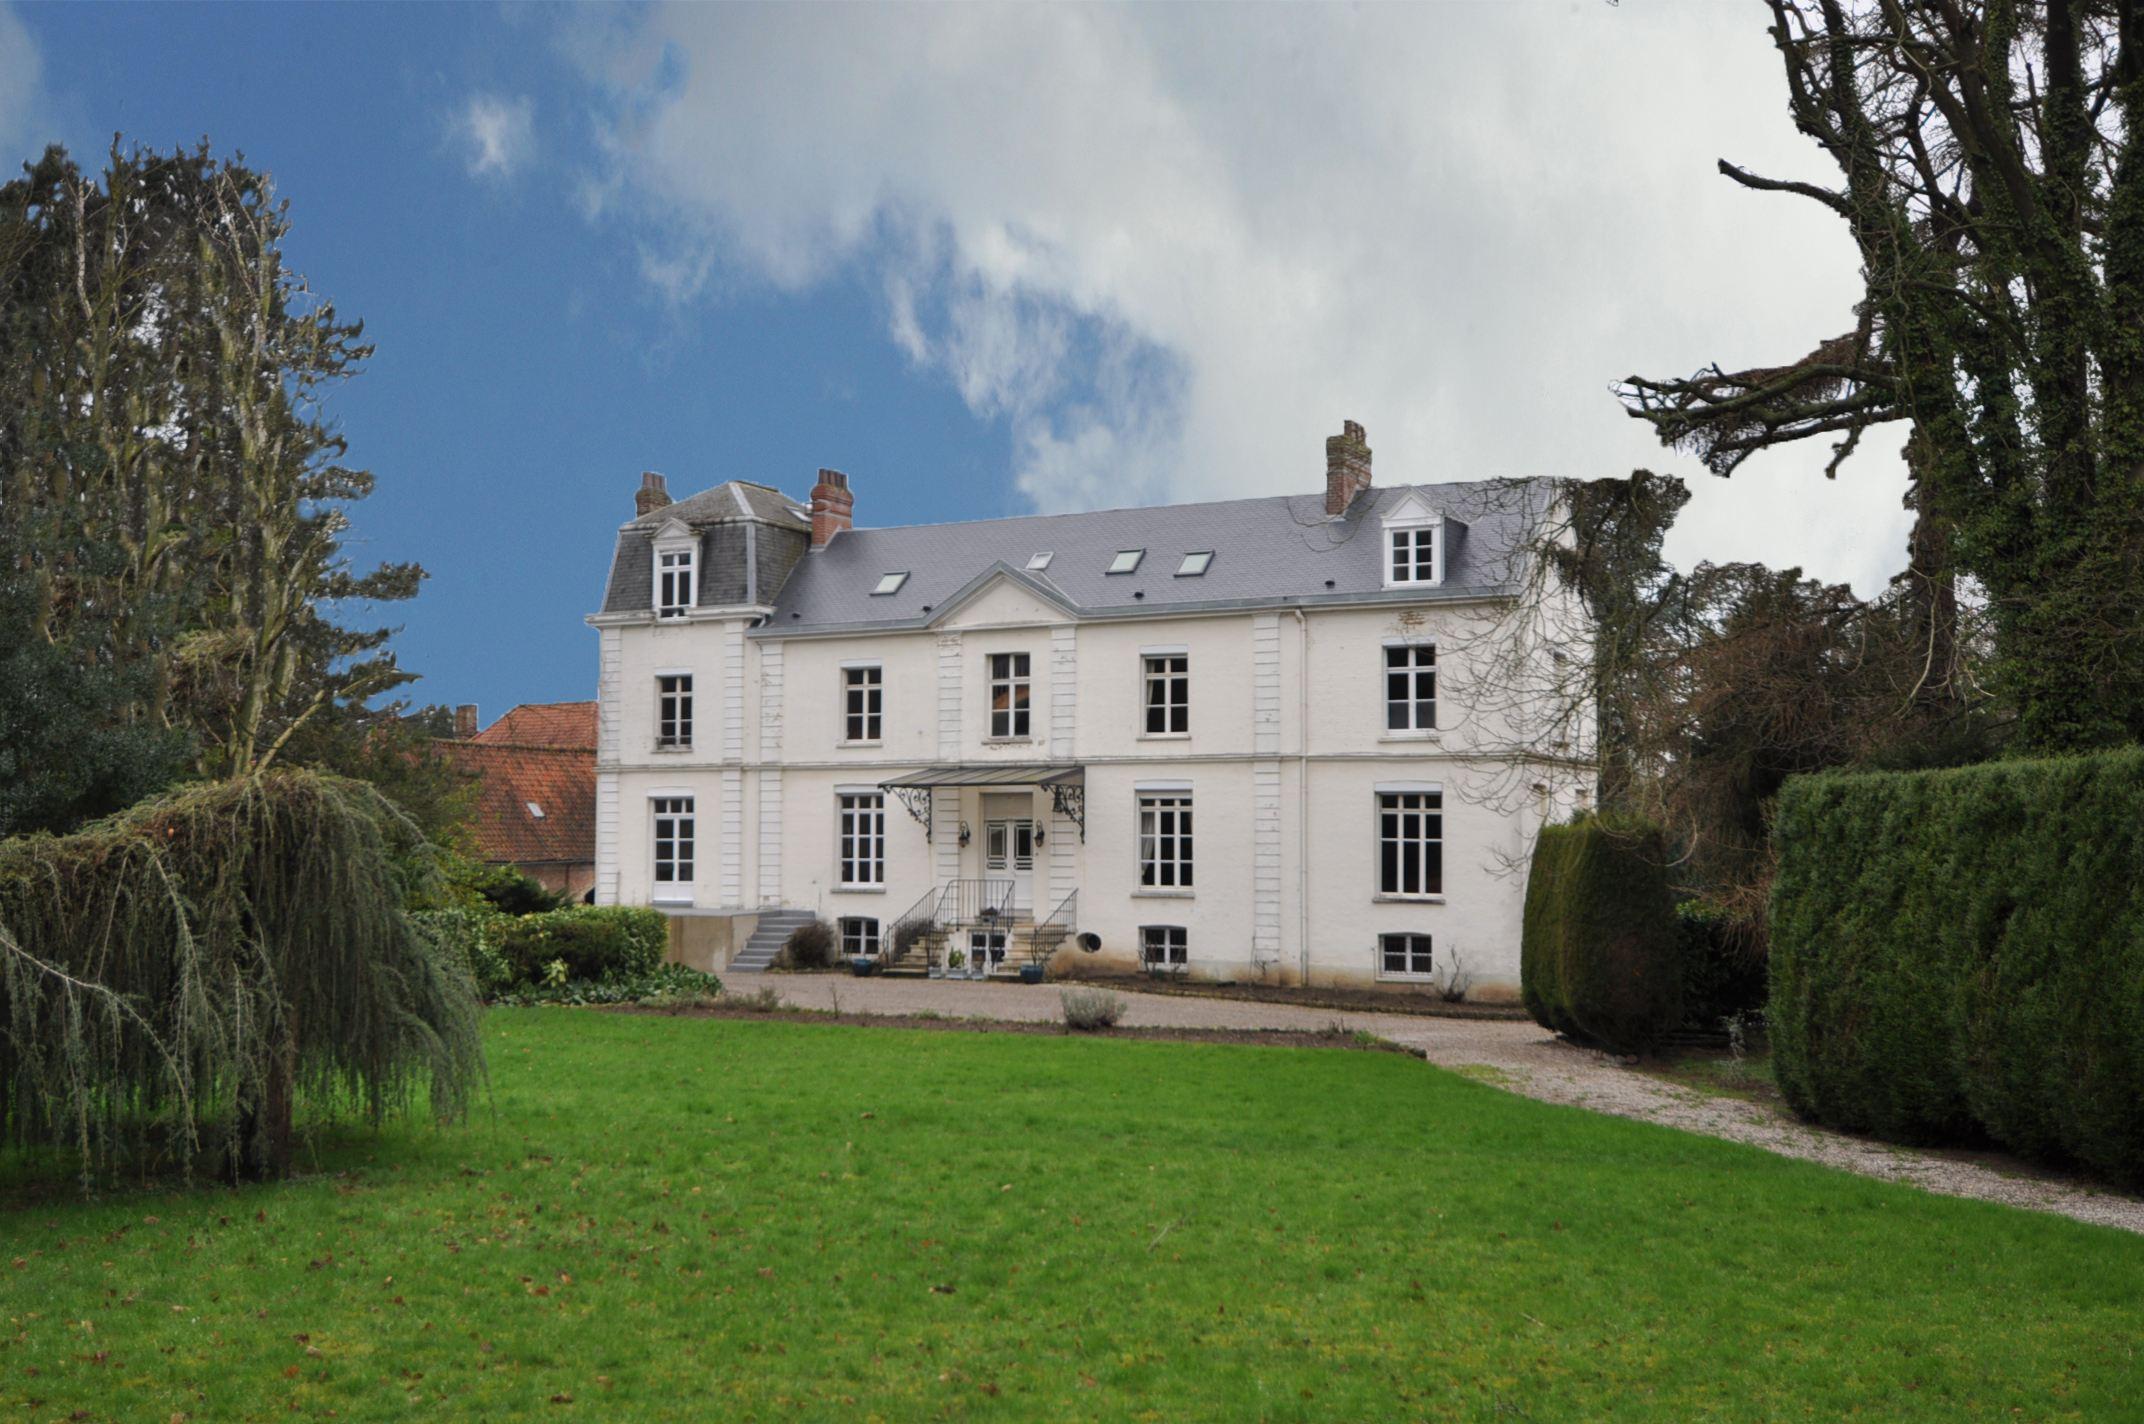 Single Family Home for Sale at 10min from SAINT-OMER, 400sqm Master house. 12 Bedrooms. Other Nord Pas De Calais, Nord Pas De Calais, 62500 France